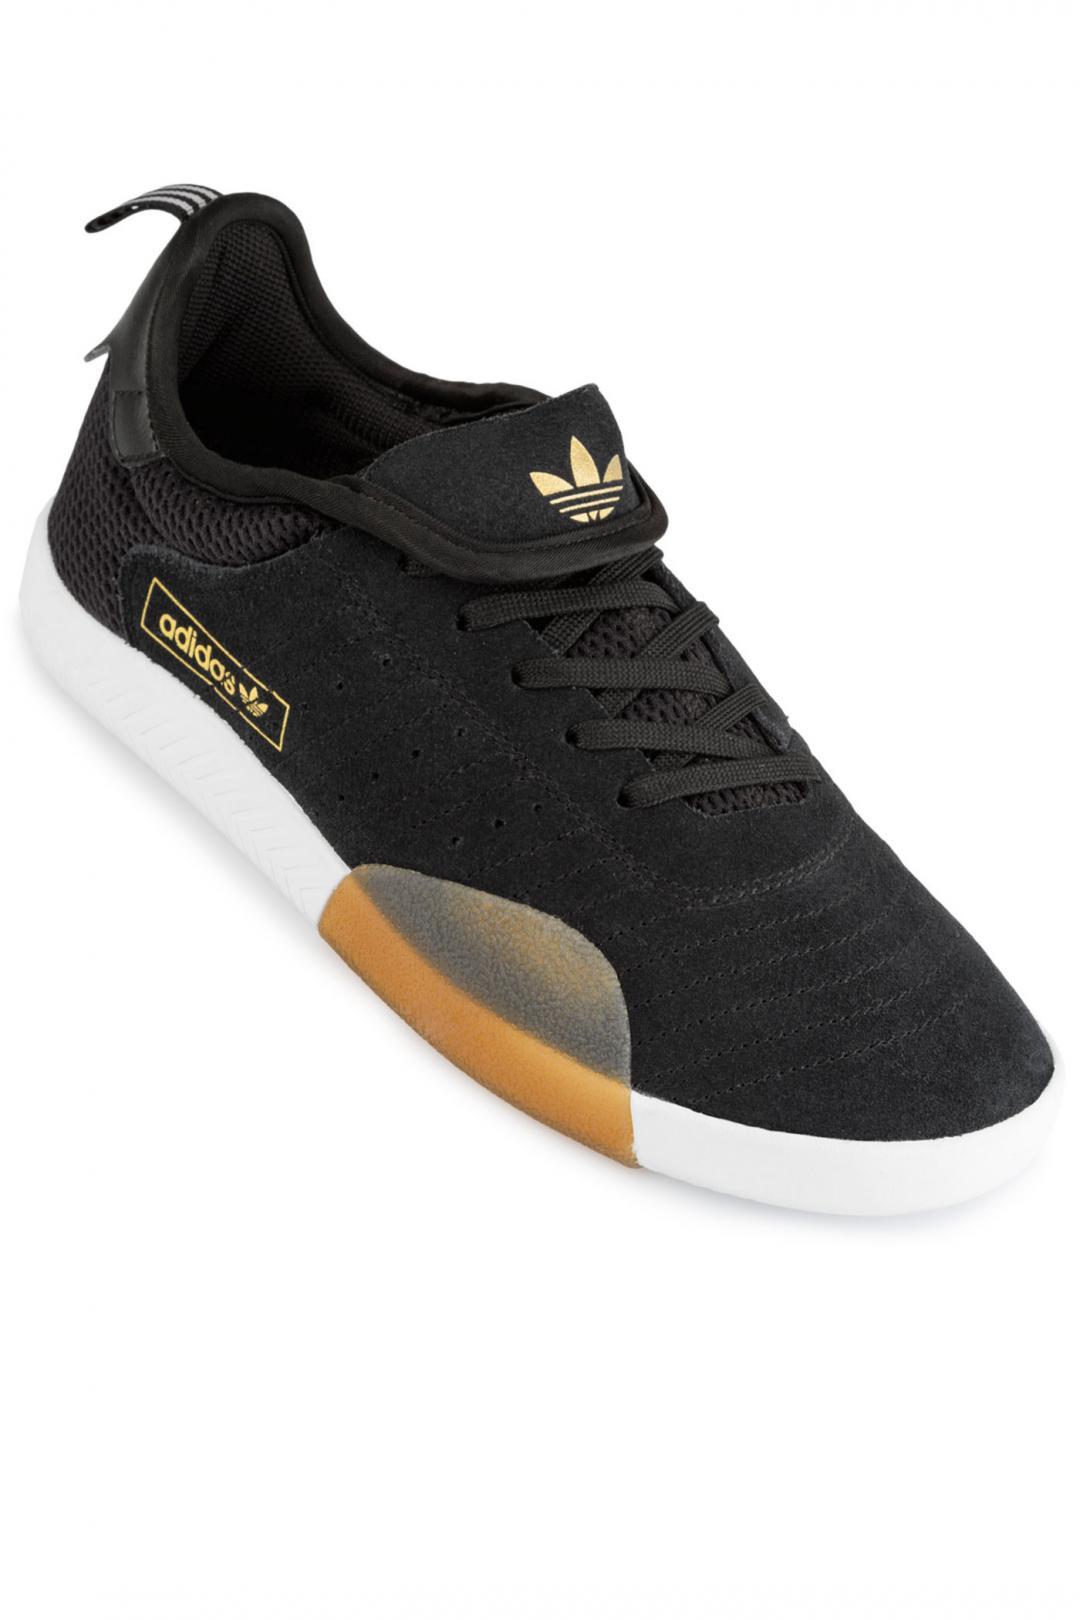 Uomo adidas Skateboarding 3ST.003 core black light granite   Sneaker